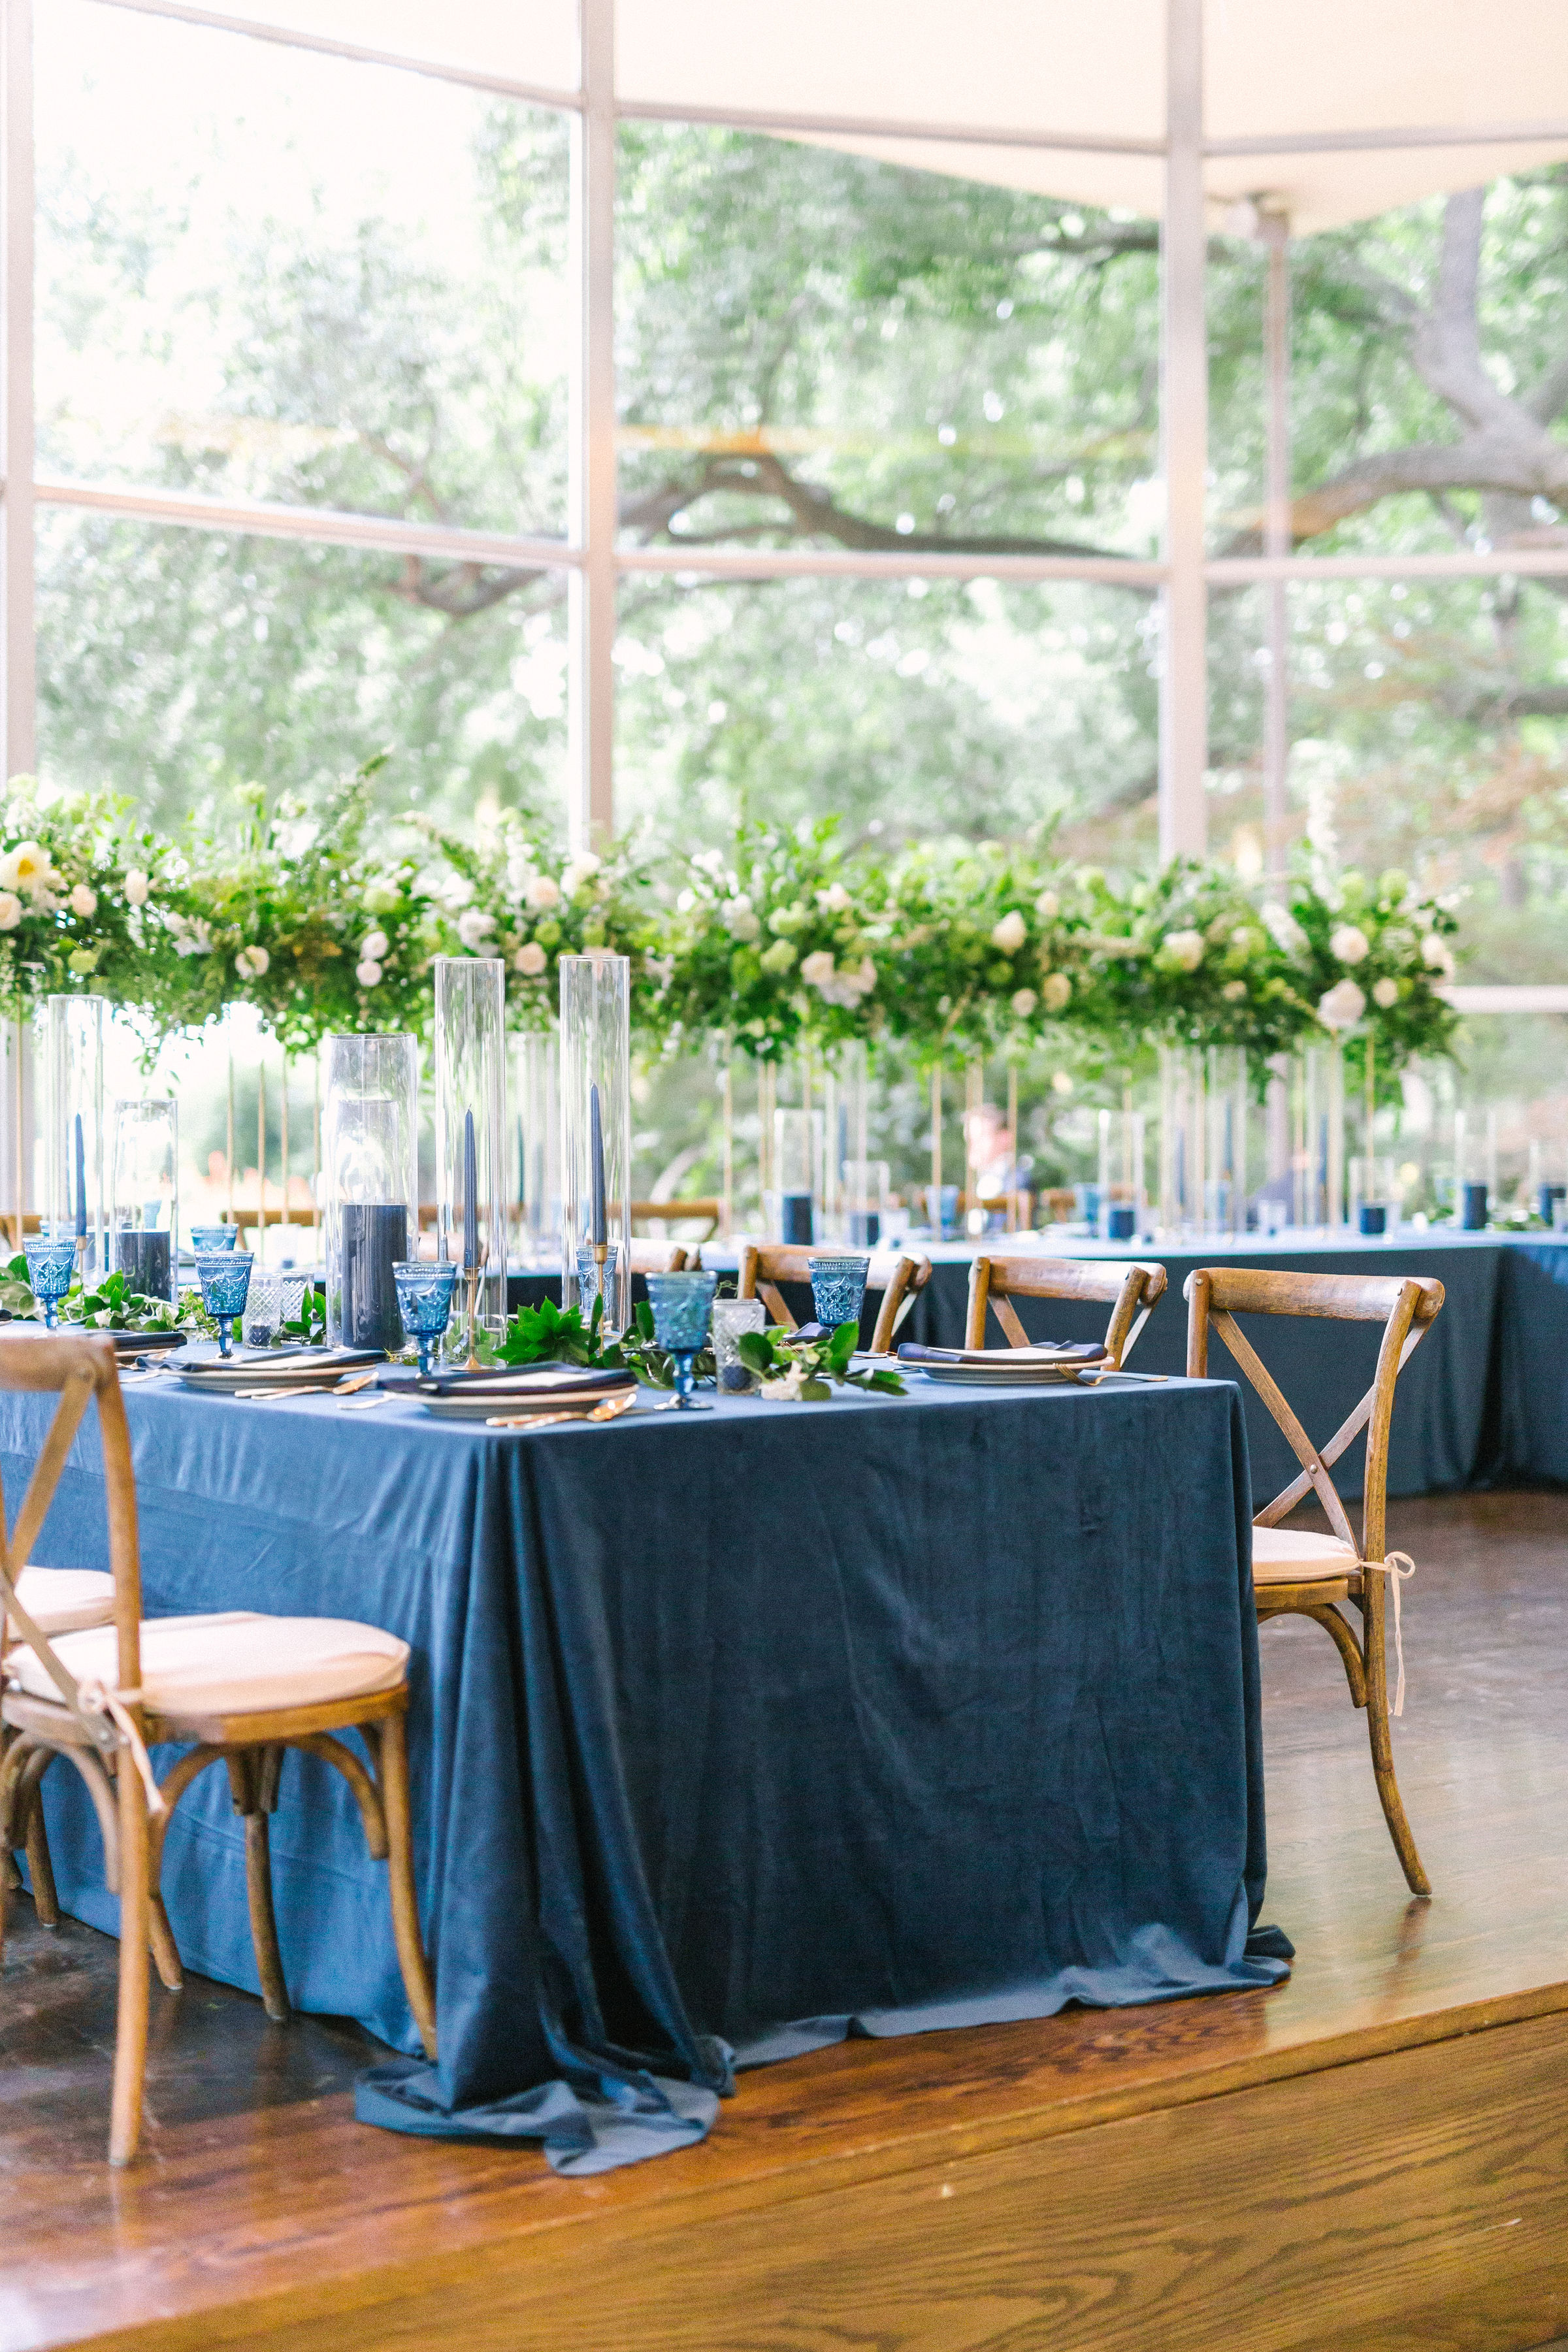 Ellen-Ashton-Photography-Dallas-Wedding-Photographers-Ivory-and-vine-Weddings-863.jpg